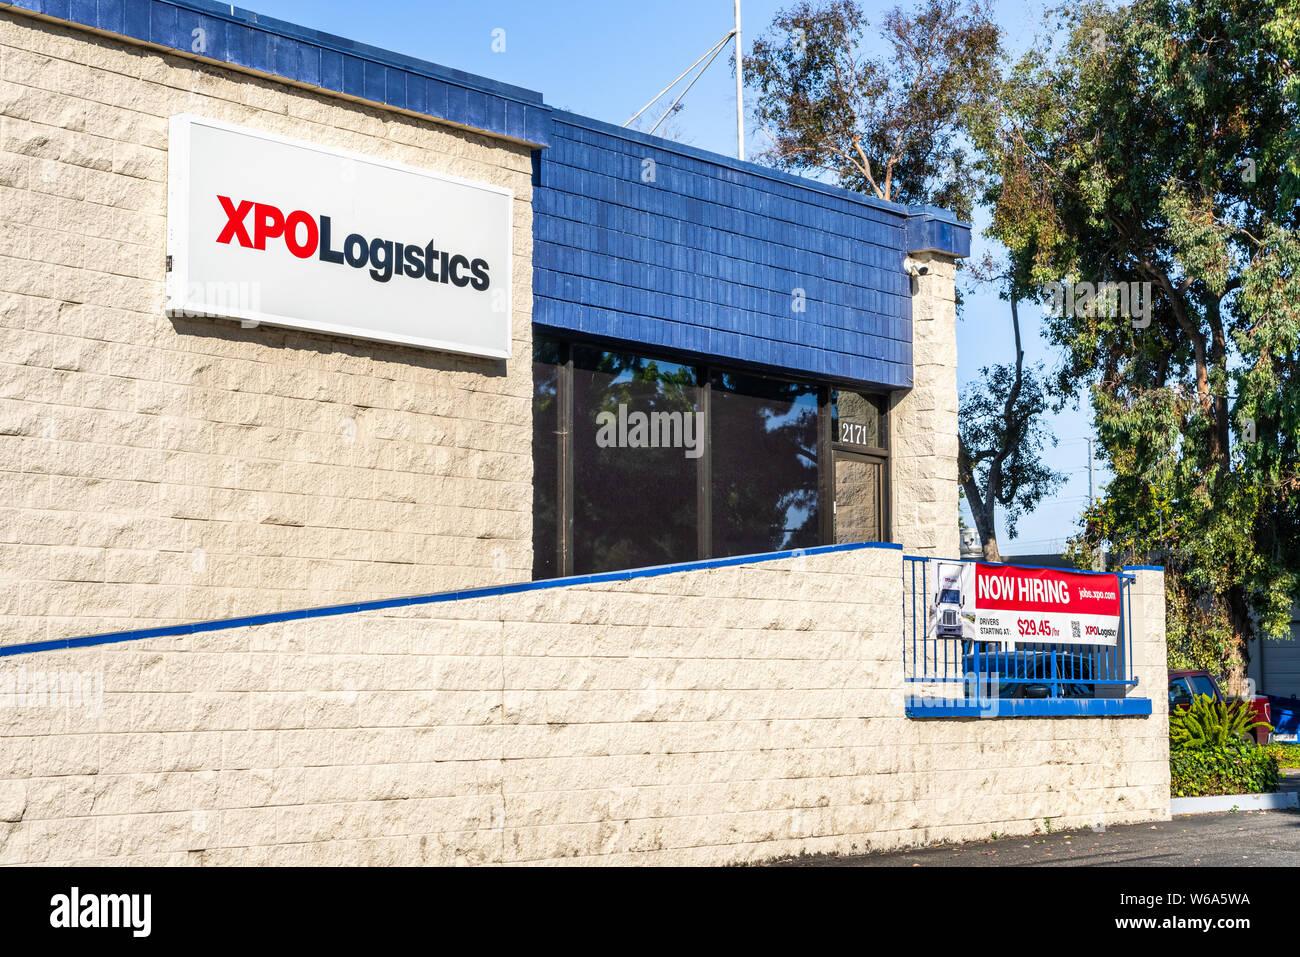 Xpo Logistics Stock Photos & Xpo Logistics Stock Images - Alamy